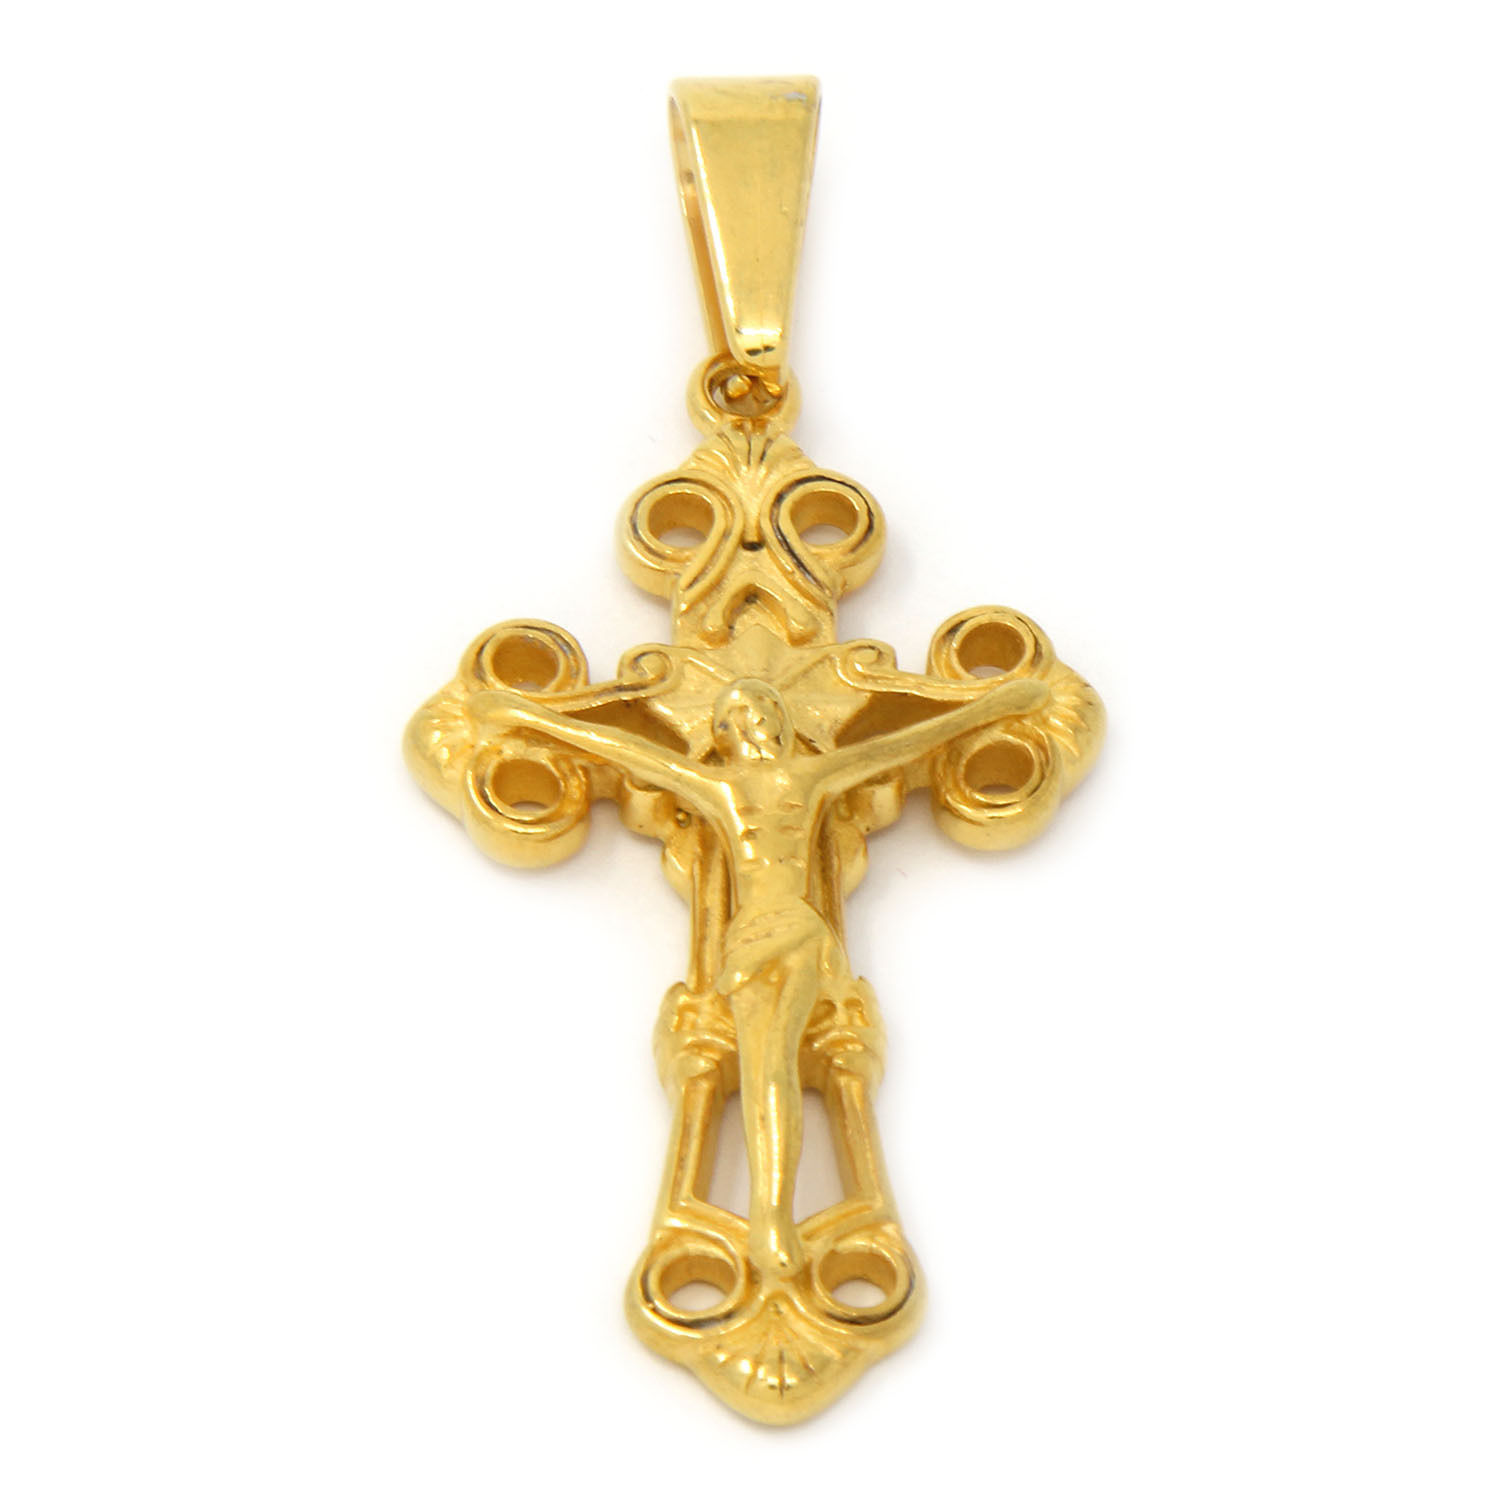 "Men Gold Tone Stainless Steel Clover Jesus Pendant 4mm 24"" Cuban Necklace Chain"